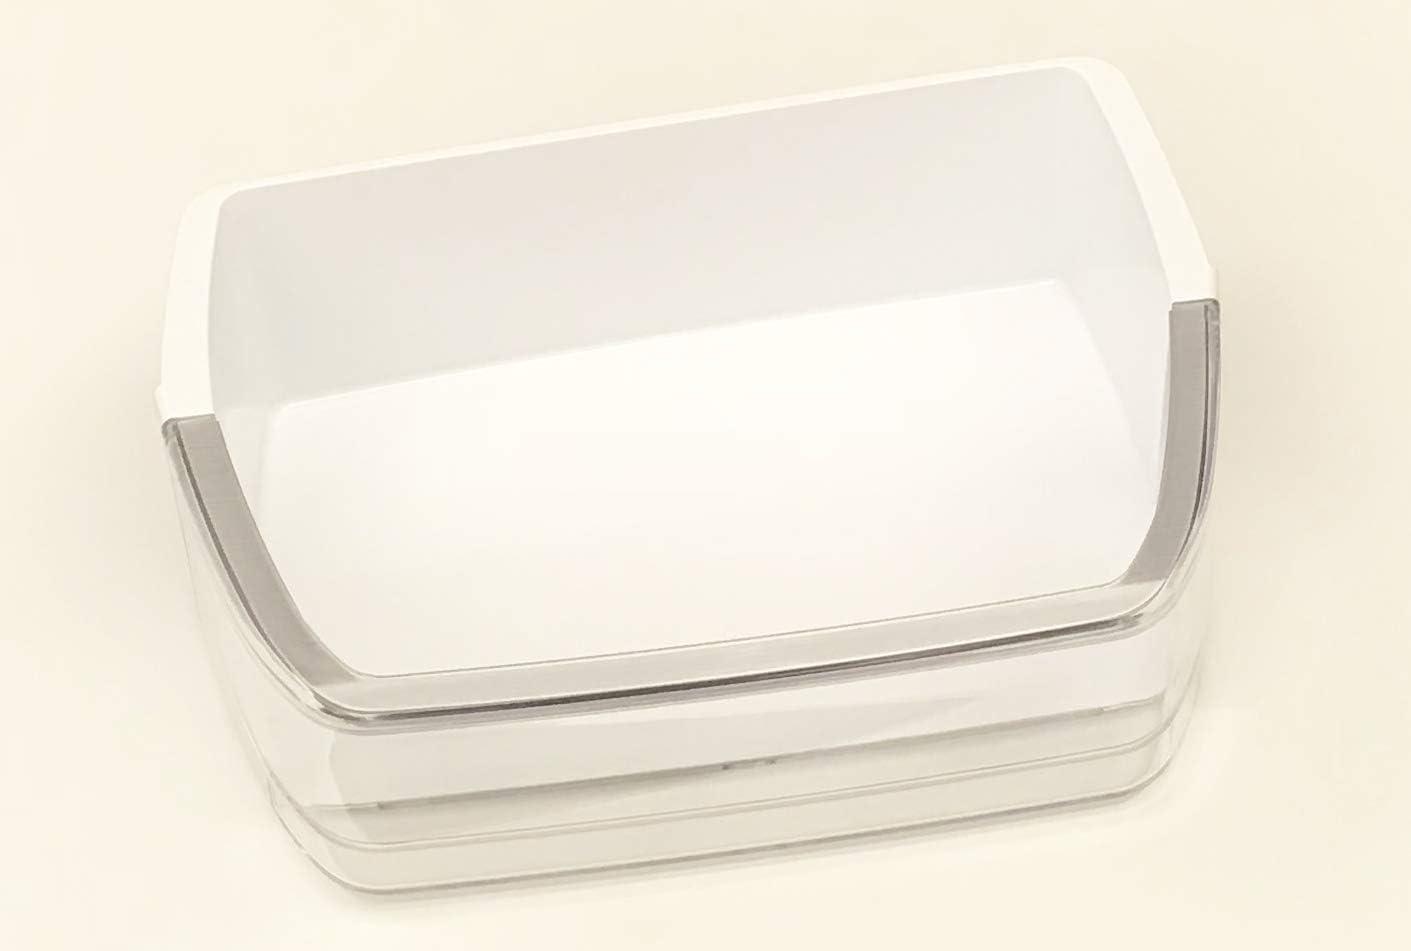 LFX32945ST OEM LG Refrigerator Door Bin Basket Shelf Tray Originally For LG LFX31945ST LMX30995ST LFX31945ST